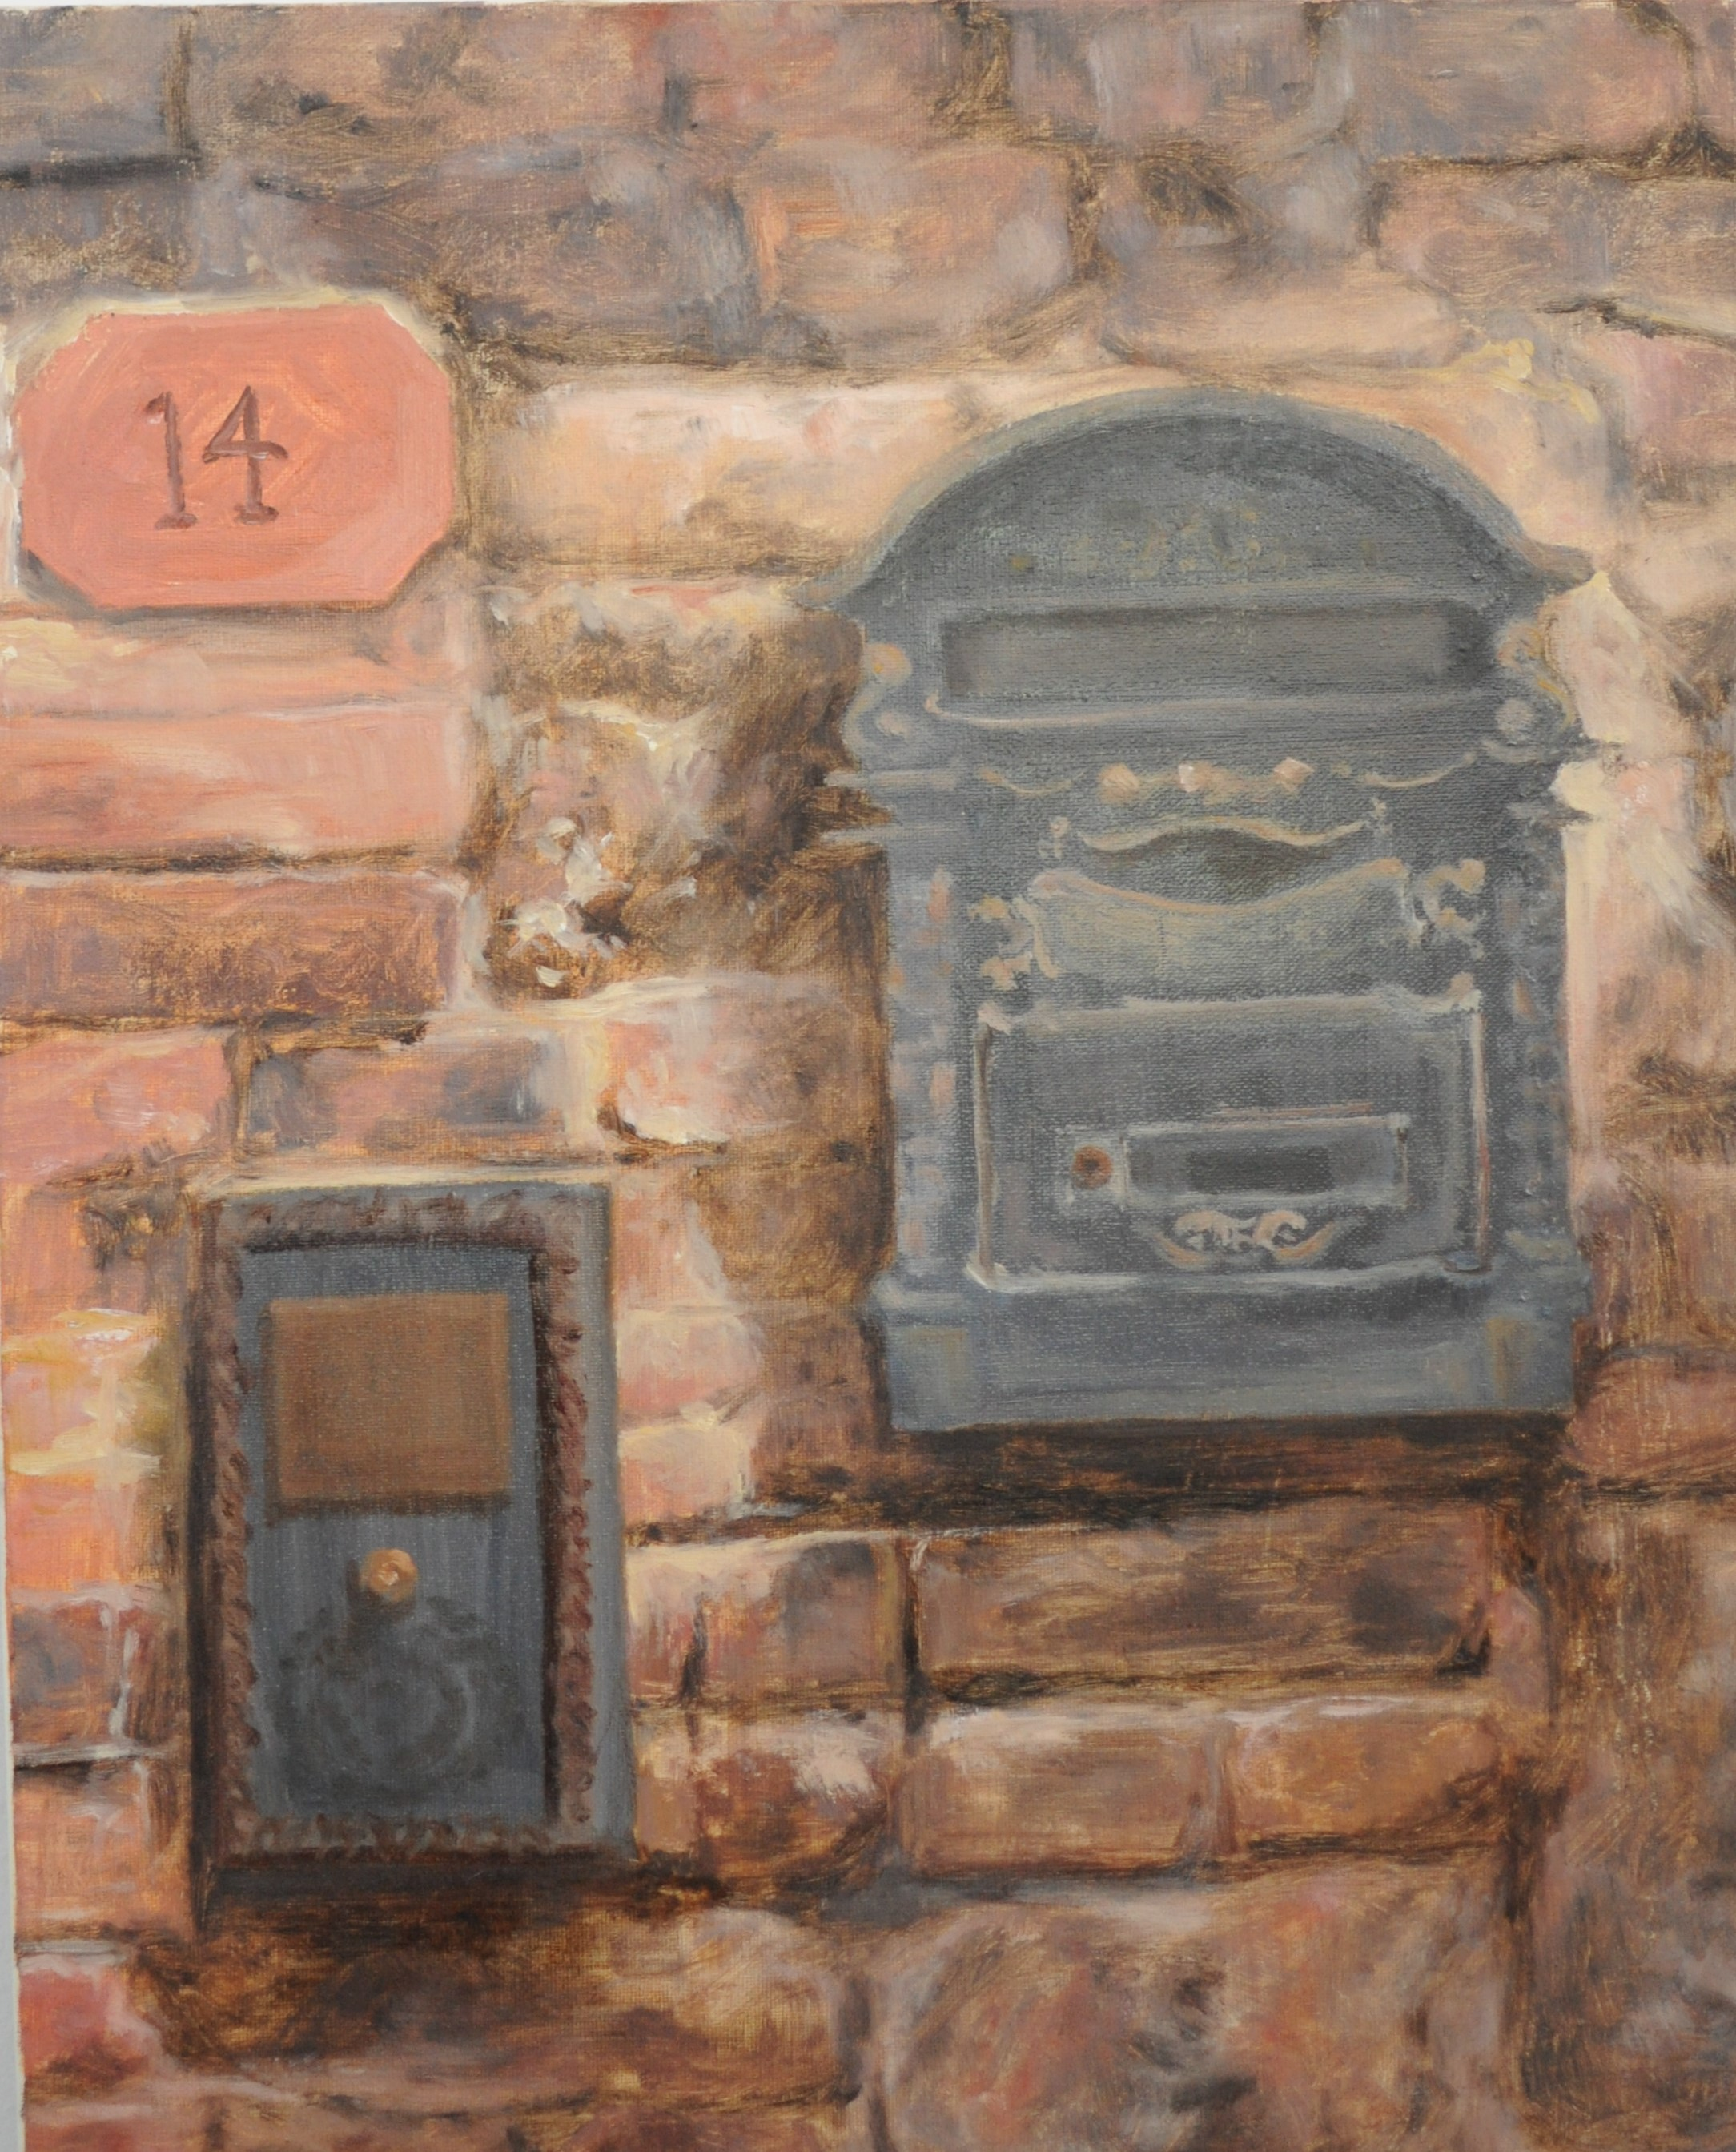 No. 14